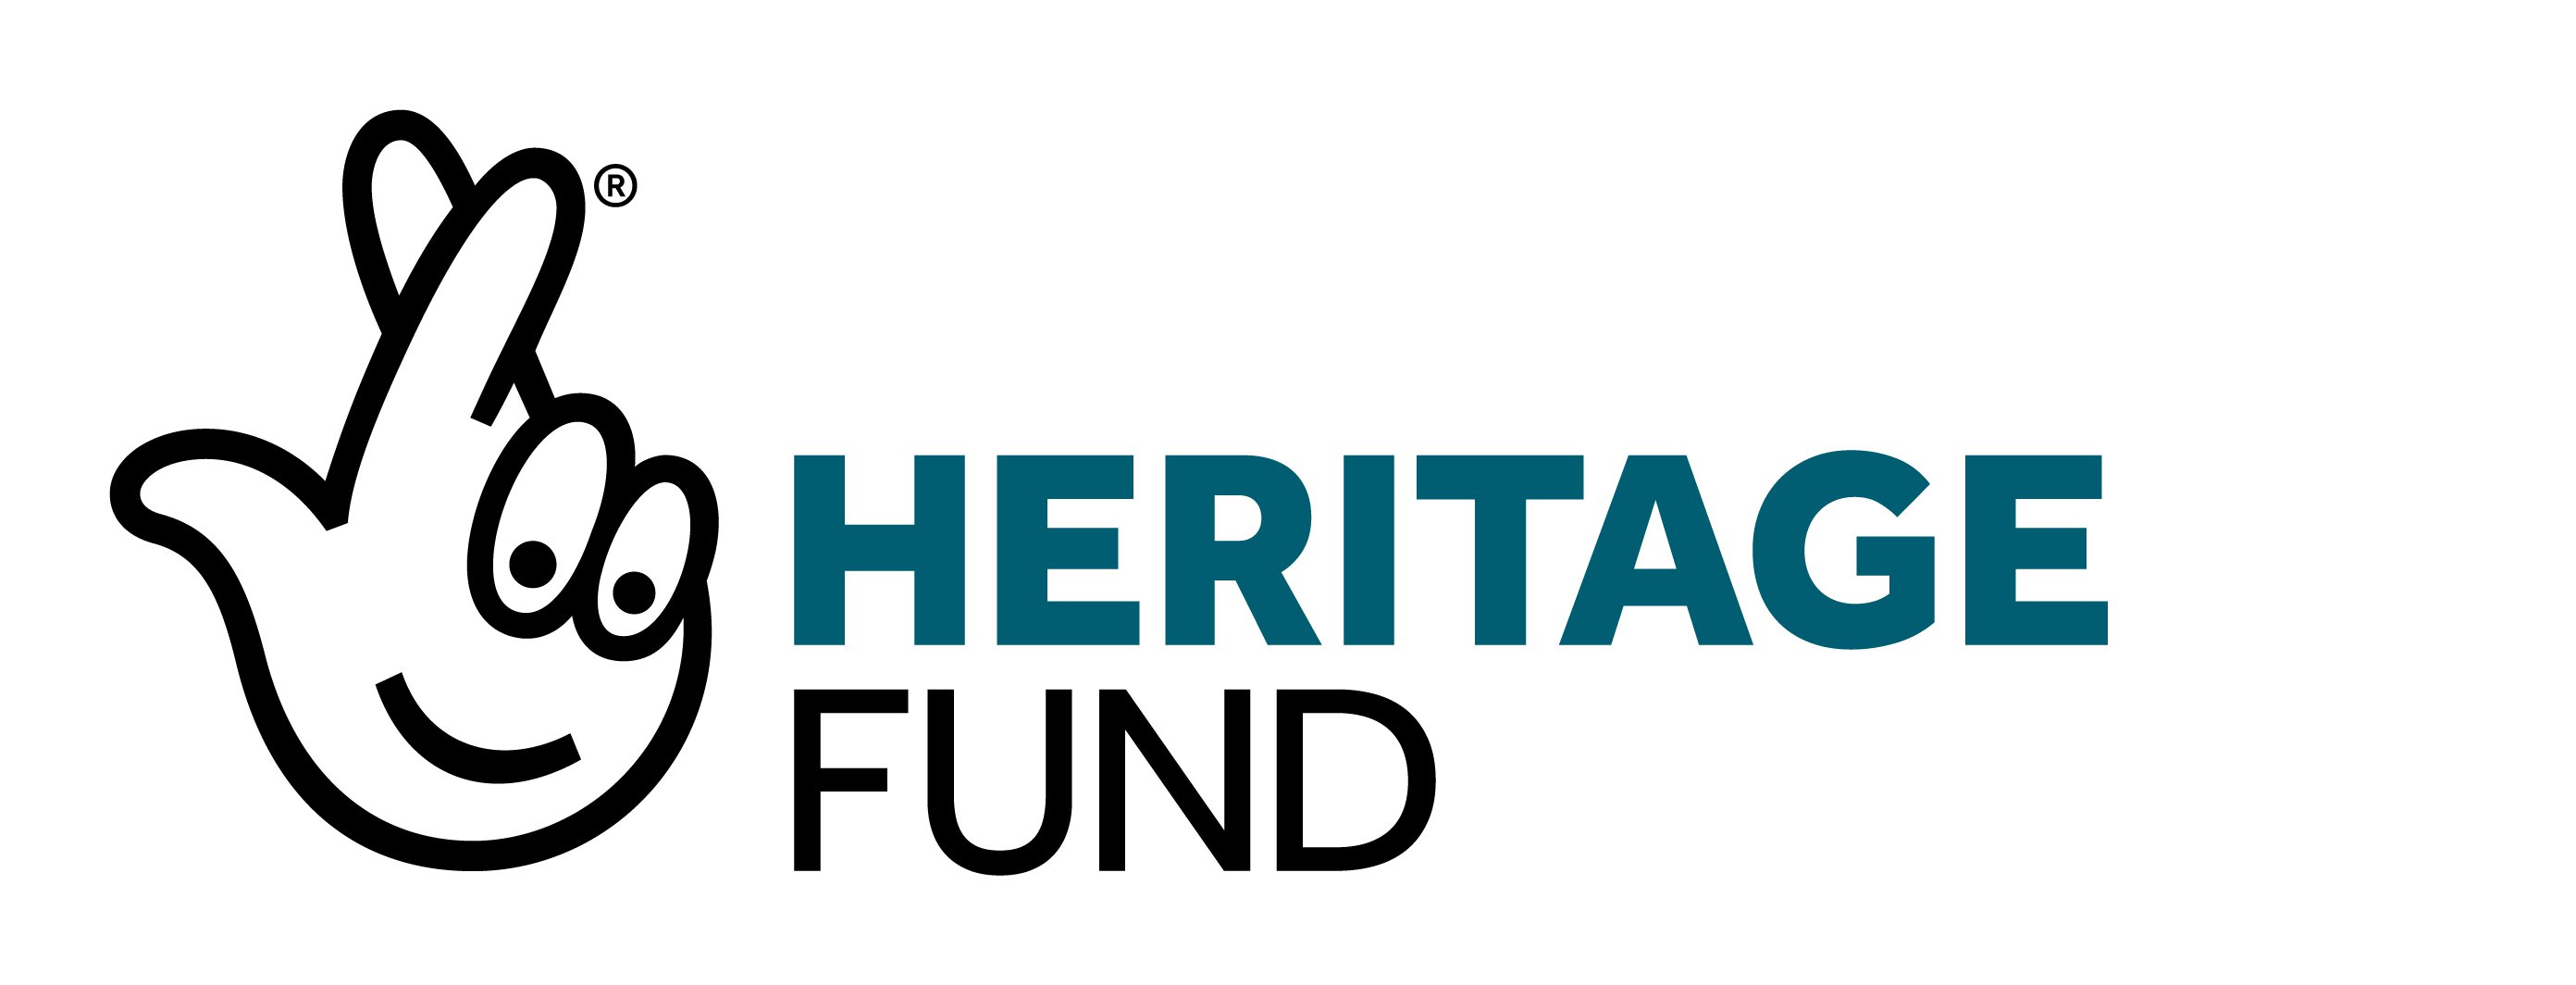 English Heritage Fund